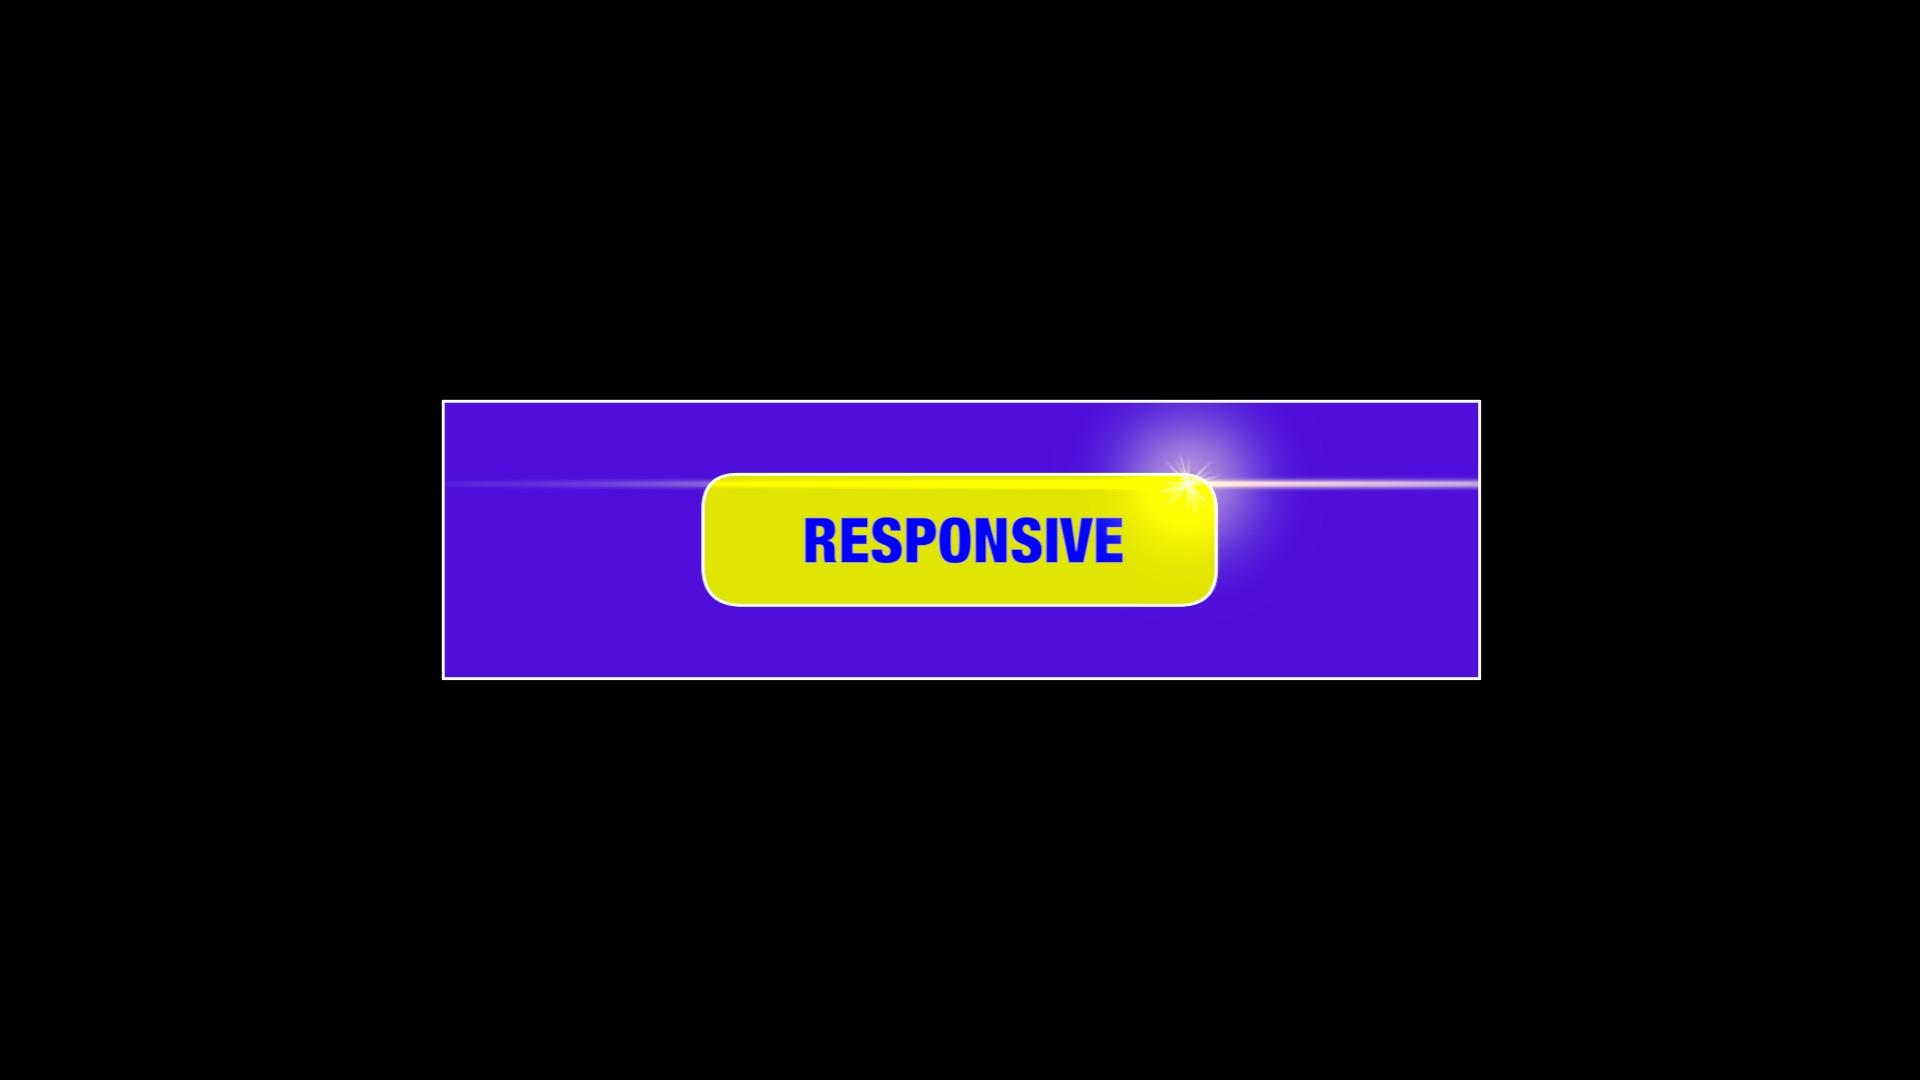 Responsive Effect Preset